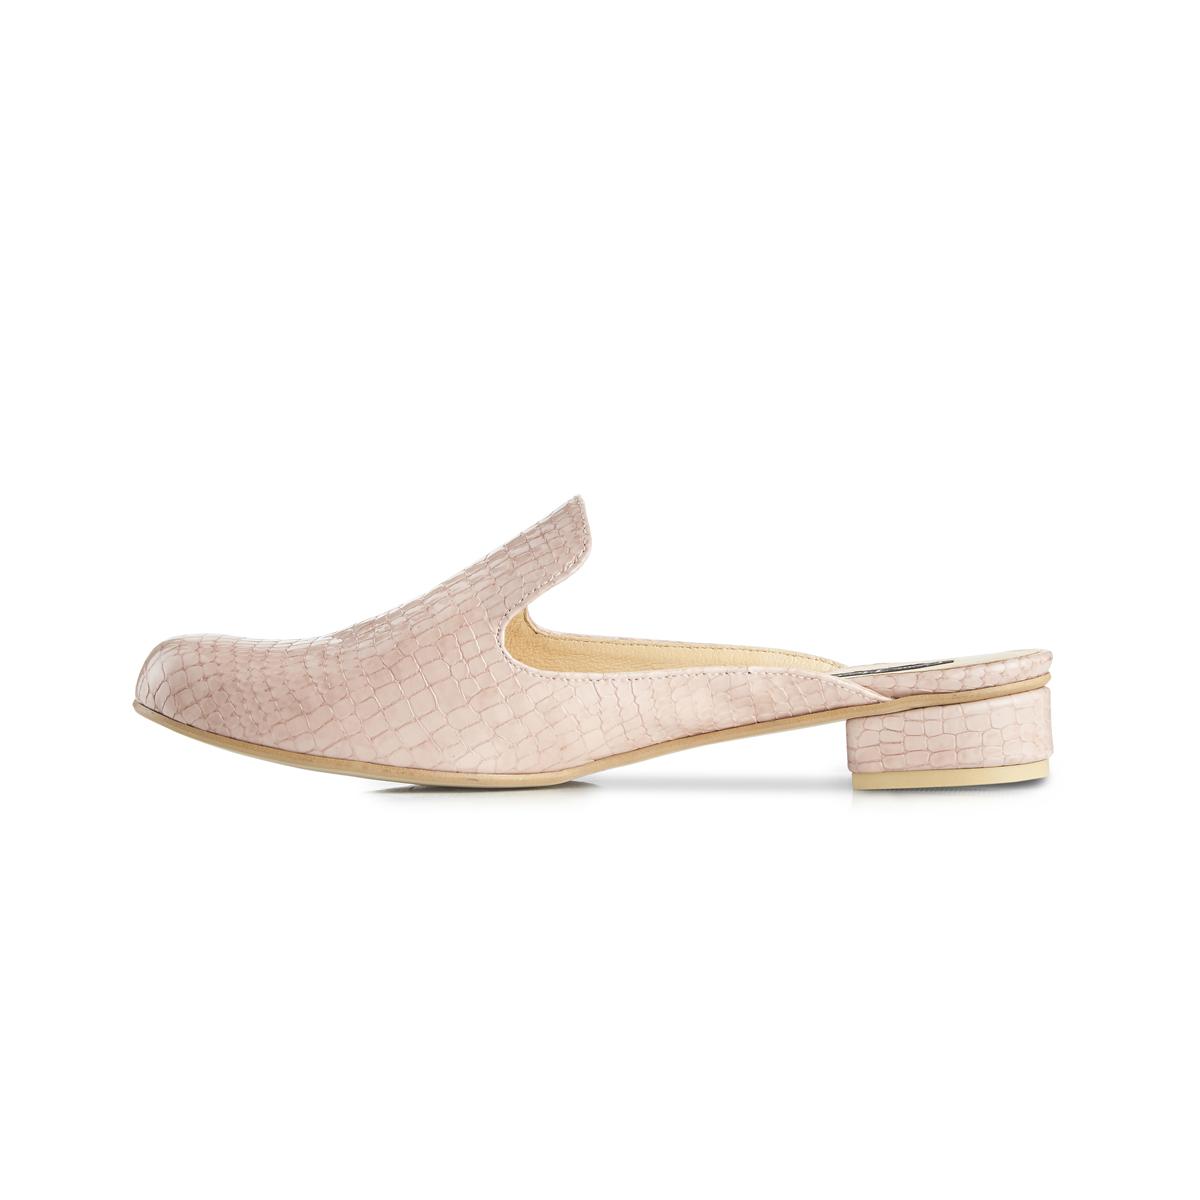 Charlie croc leather flat slip-on mules - pink